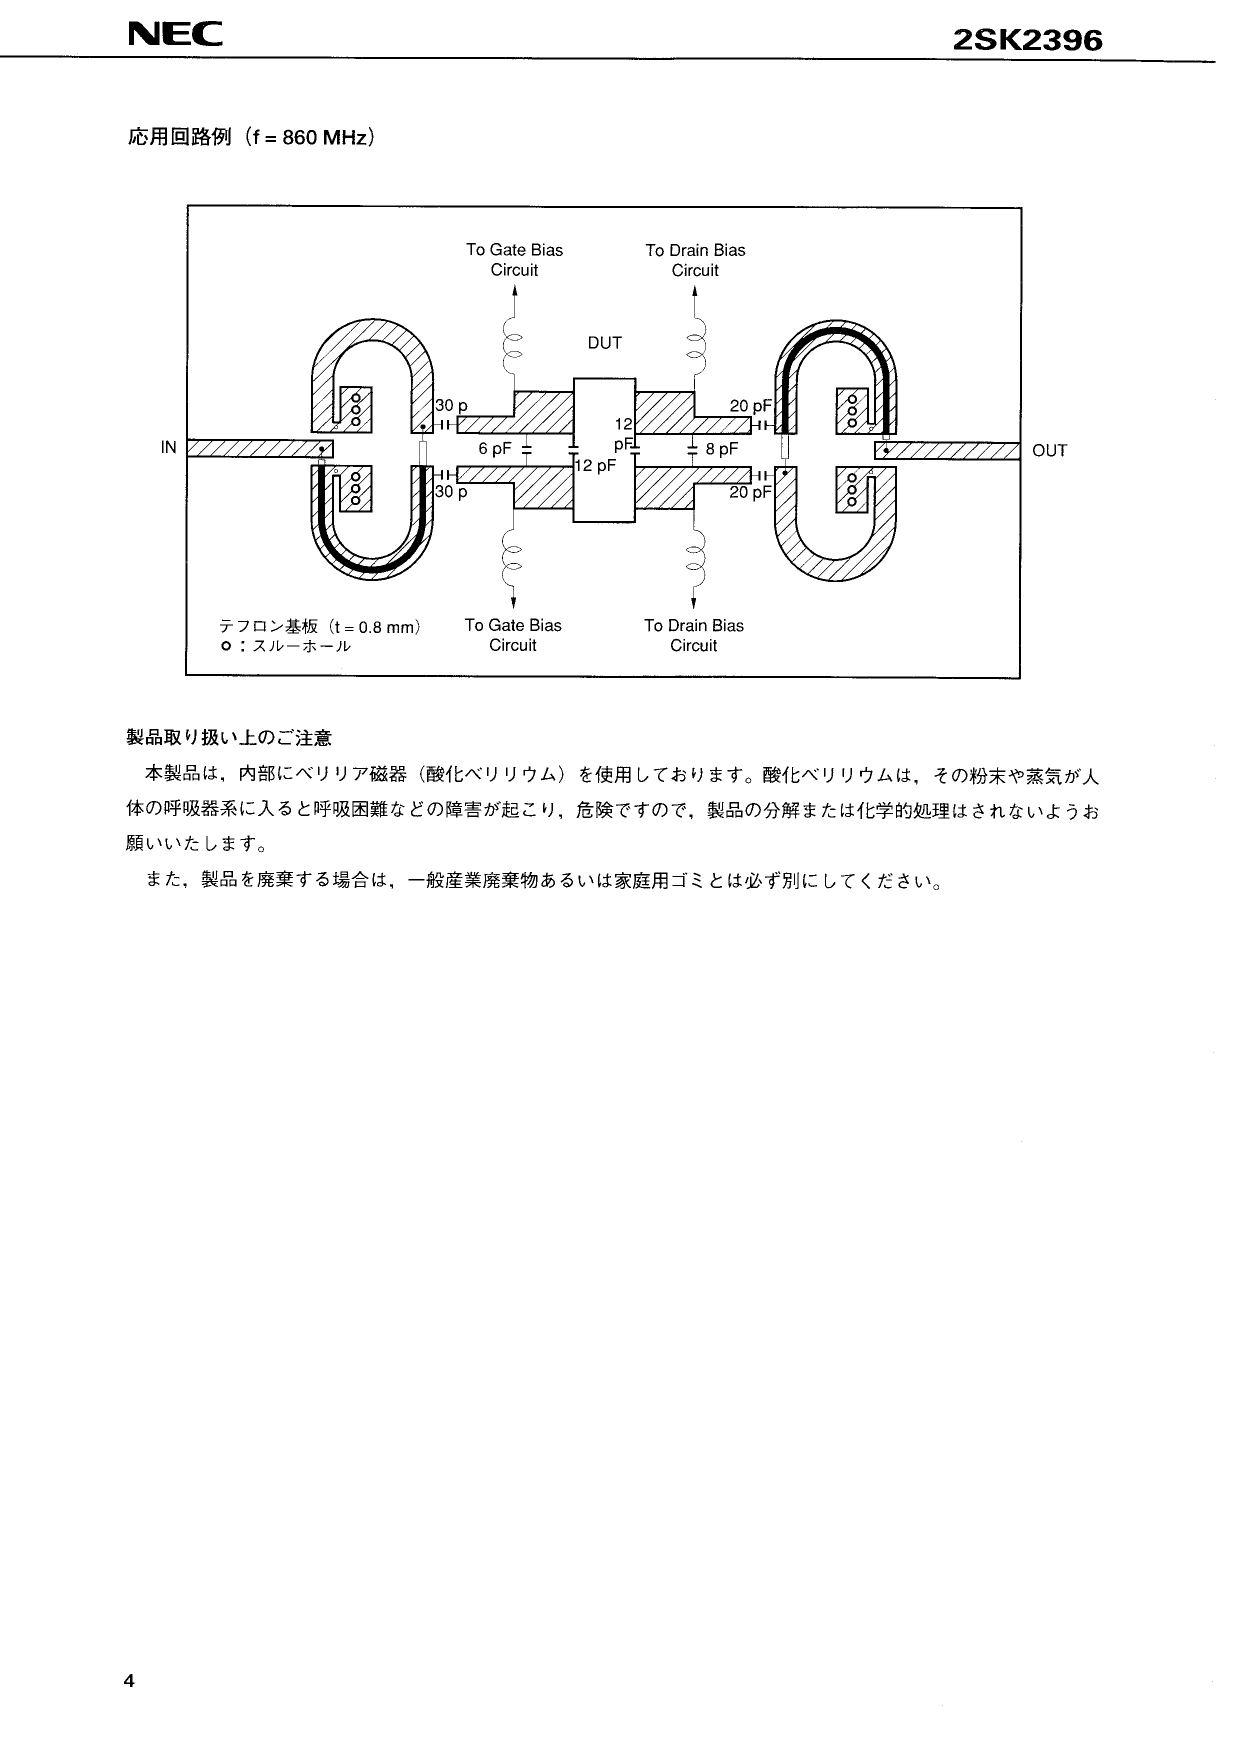 2SK2396 pdf, 반도체, 판매, 대치품